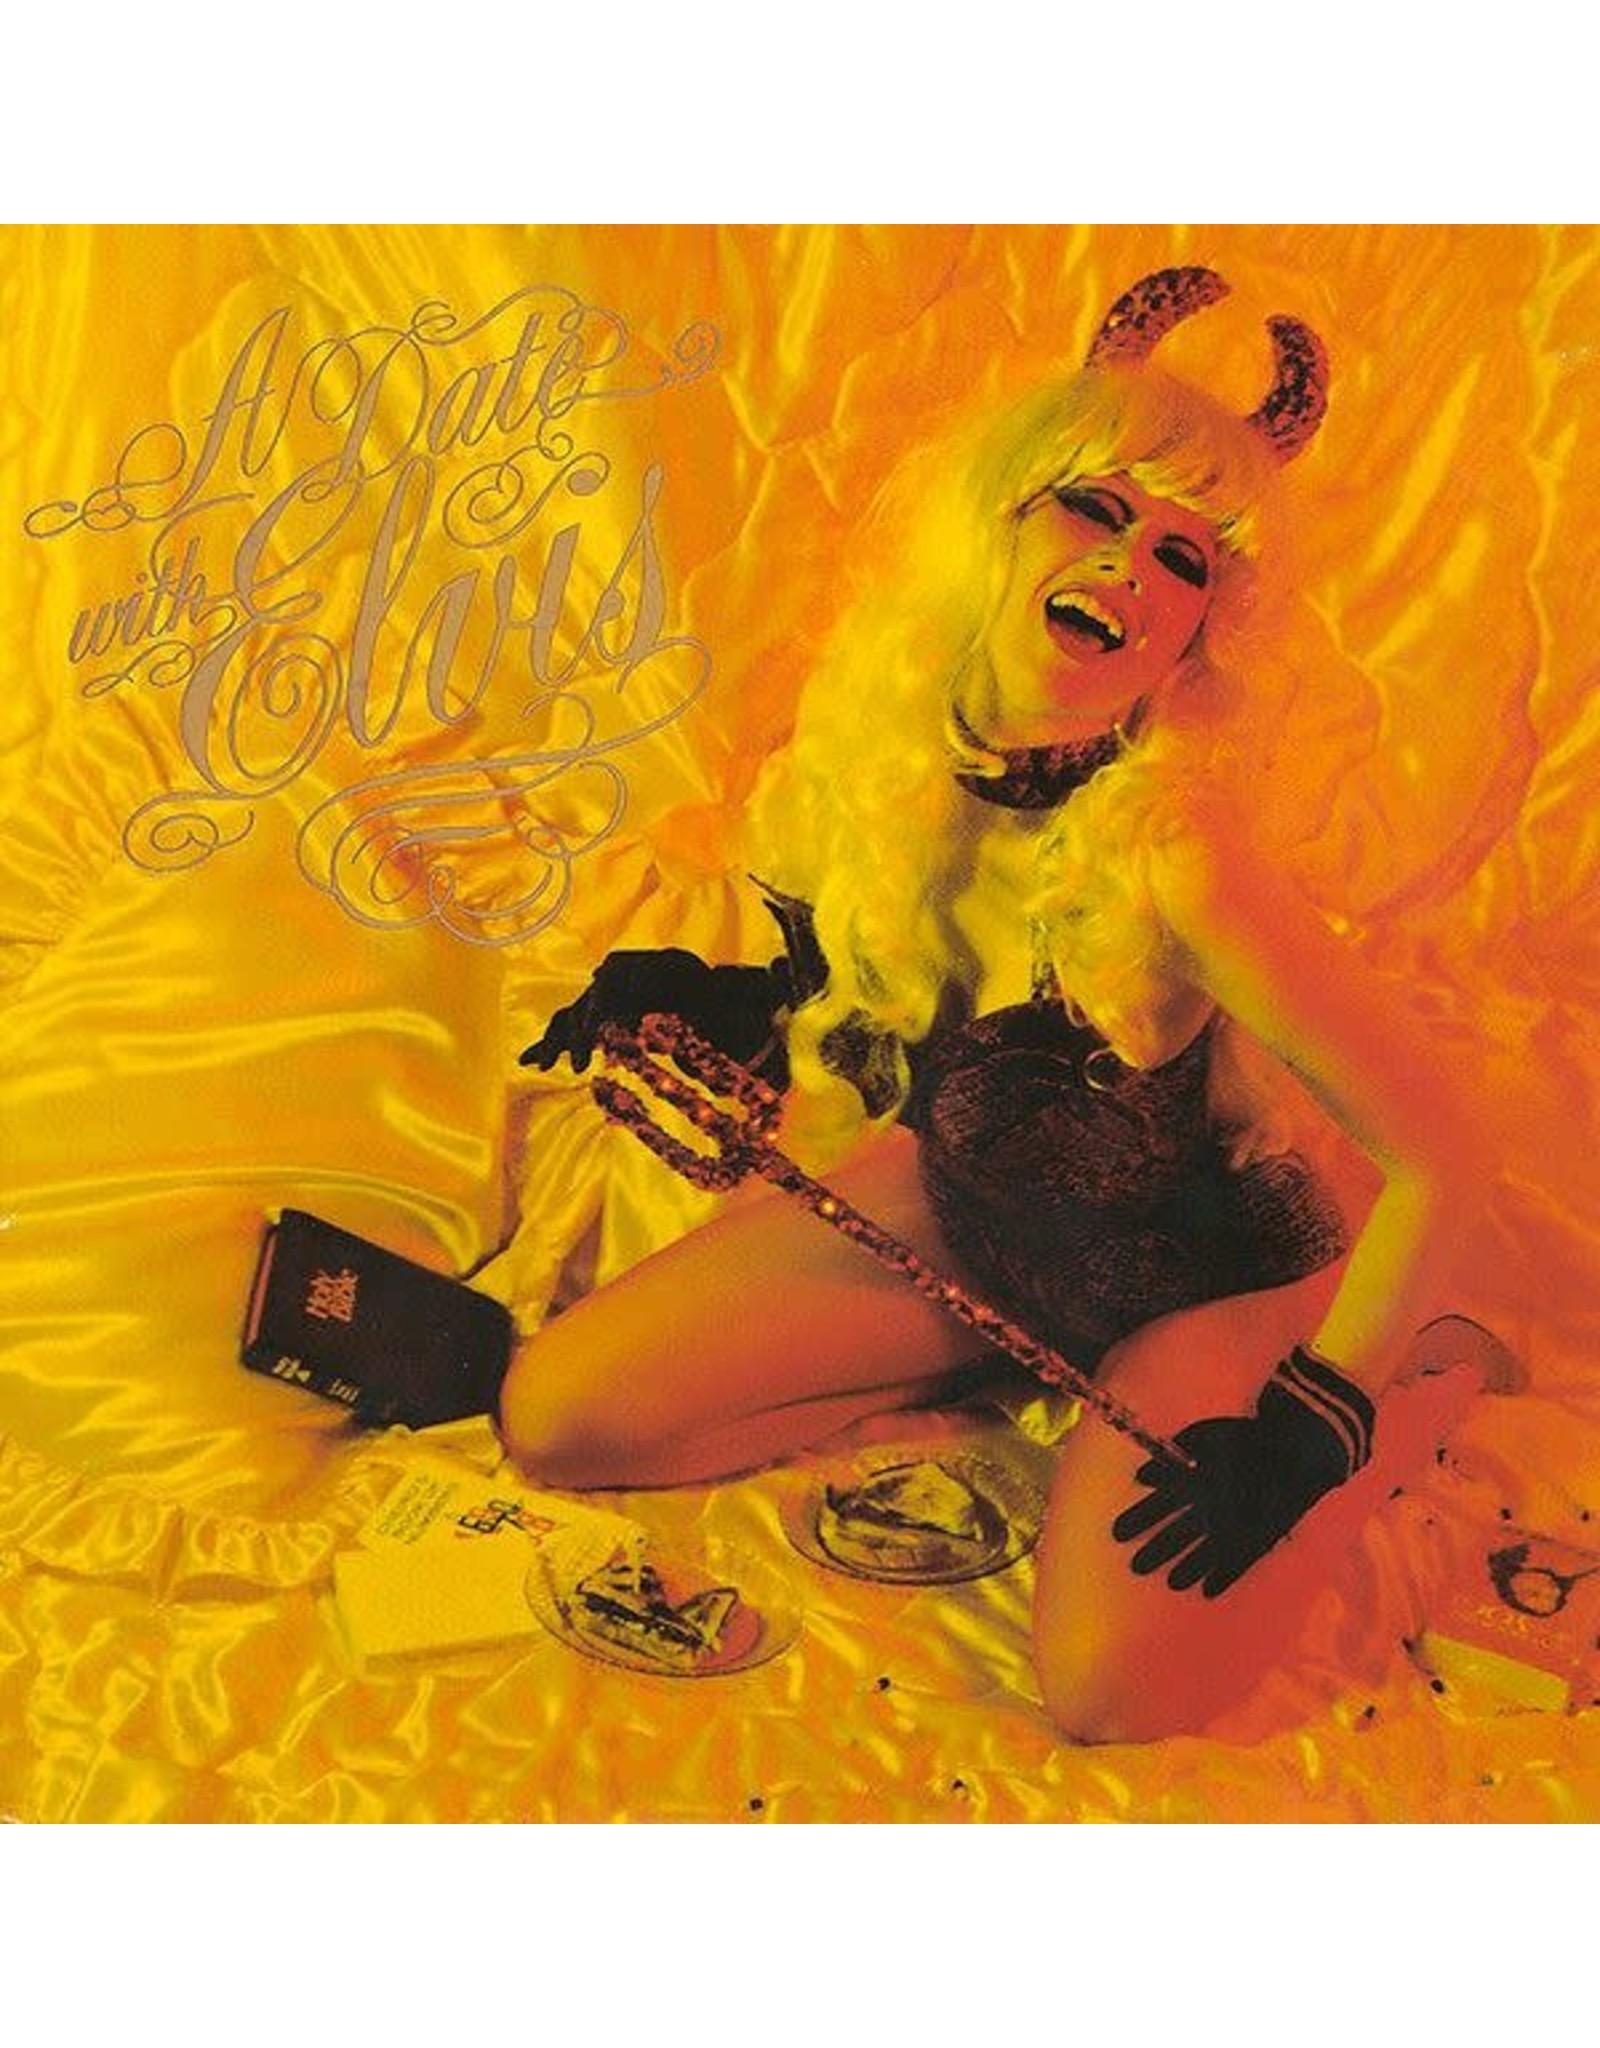 Cramps - Date With Elvis (Seville Orange Vinyl)